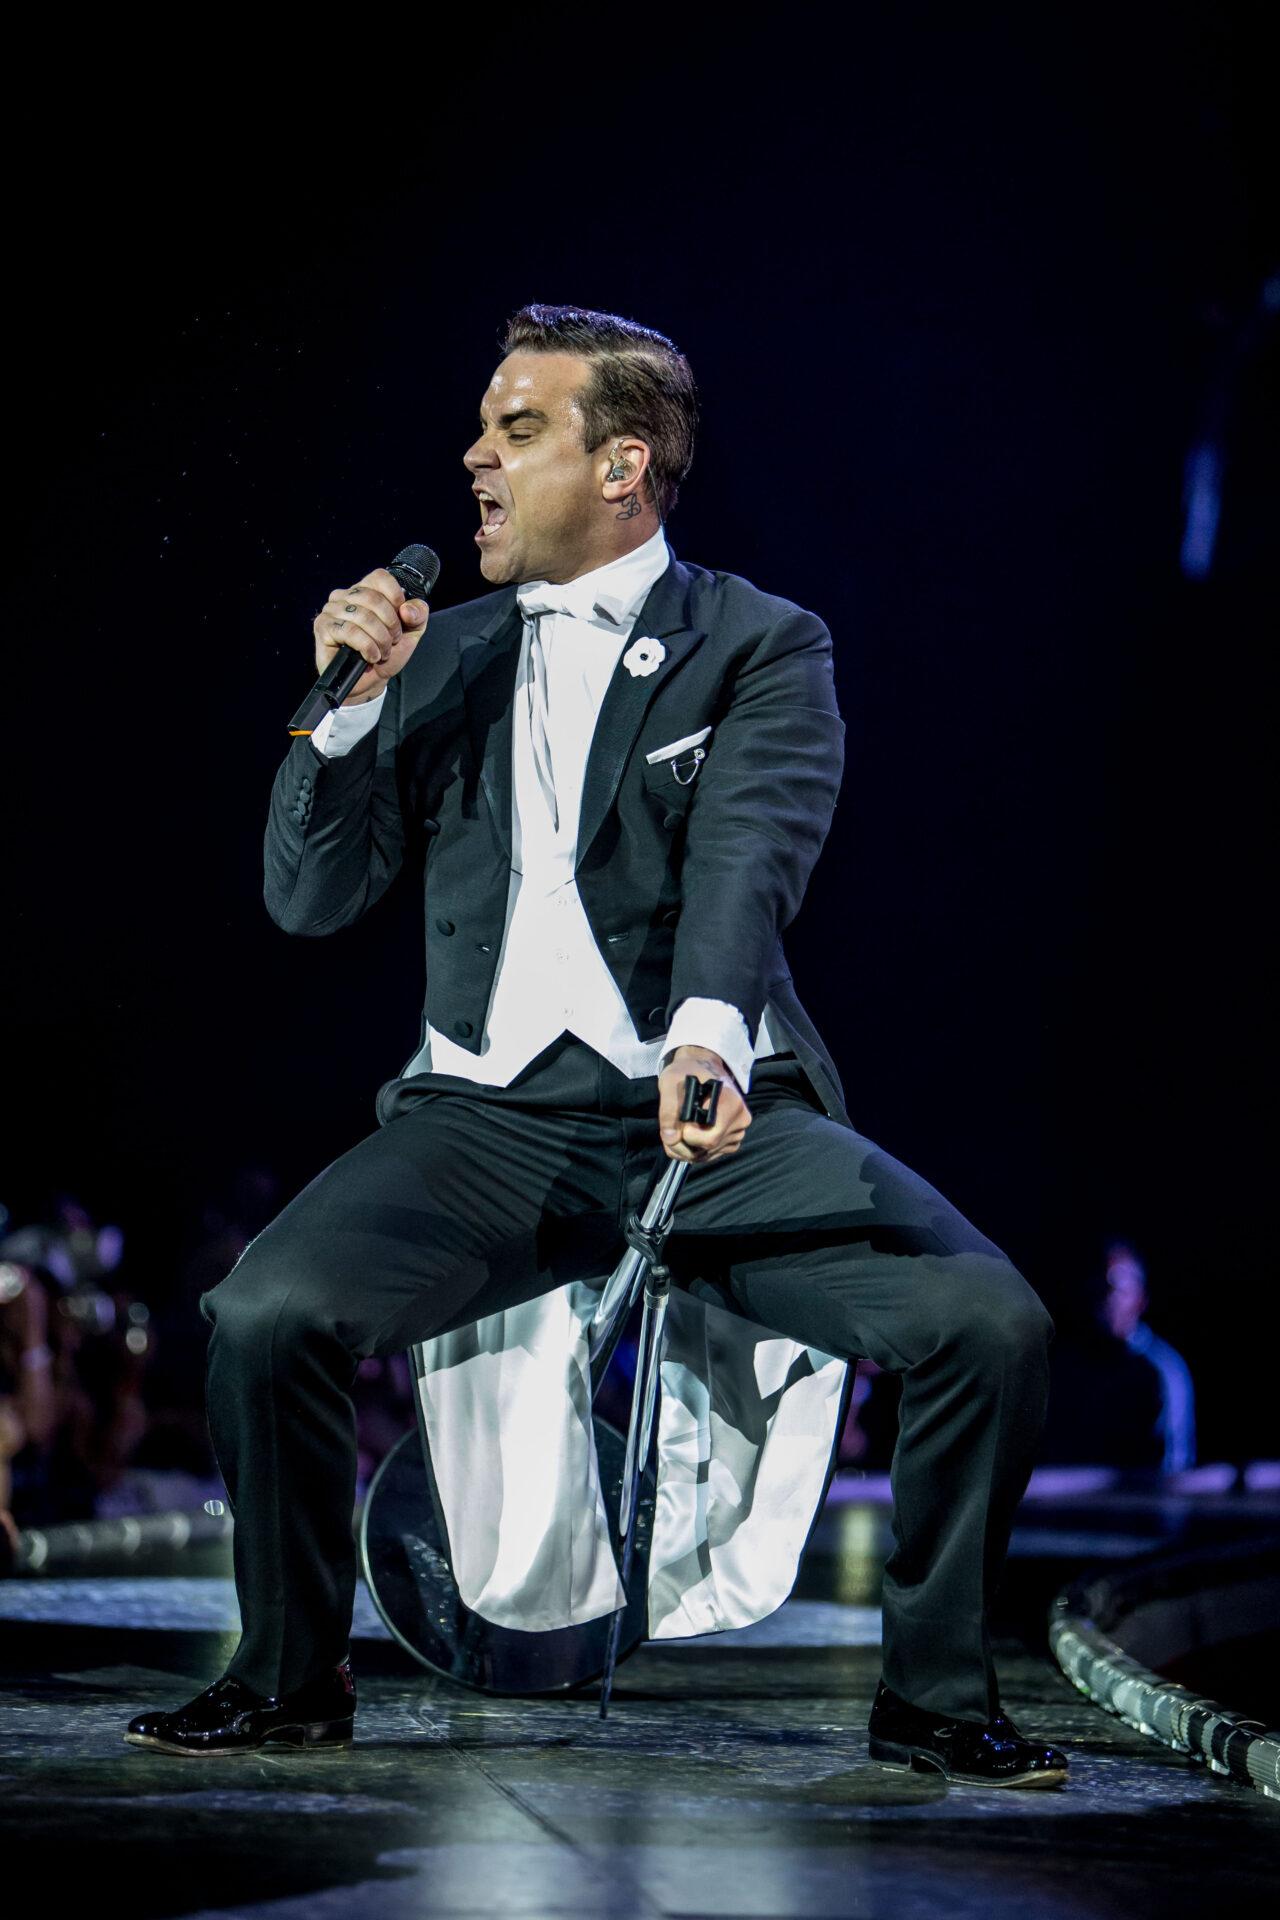 Robbie Williams Photography - Lee Blanchflower Blanc Creative Norwich